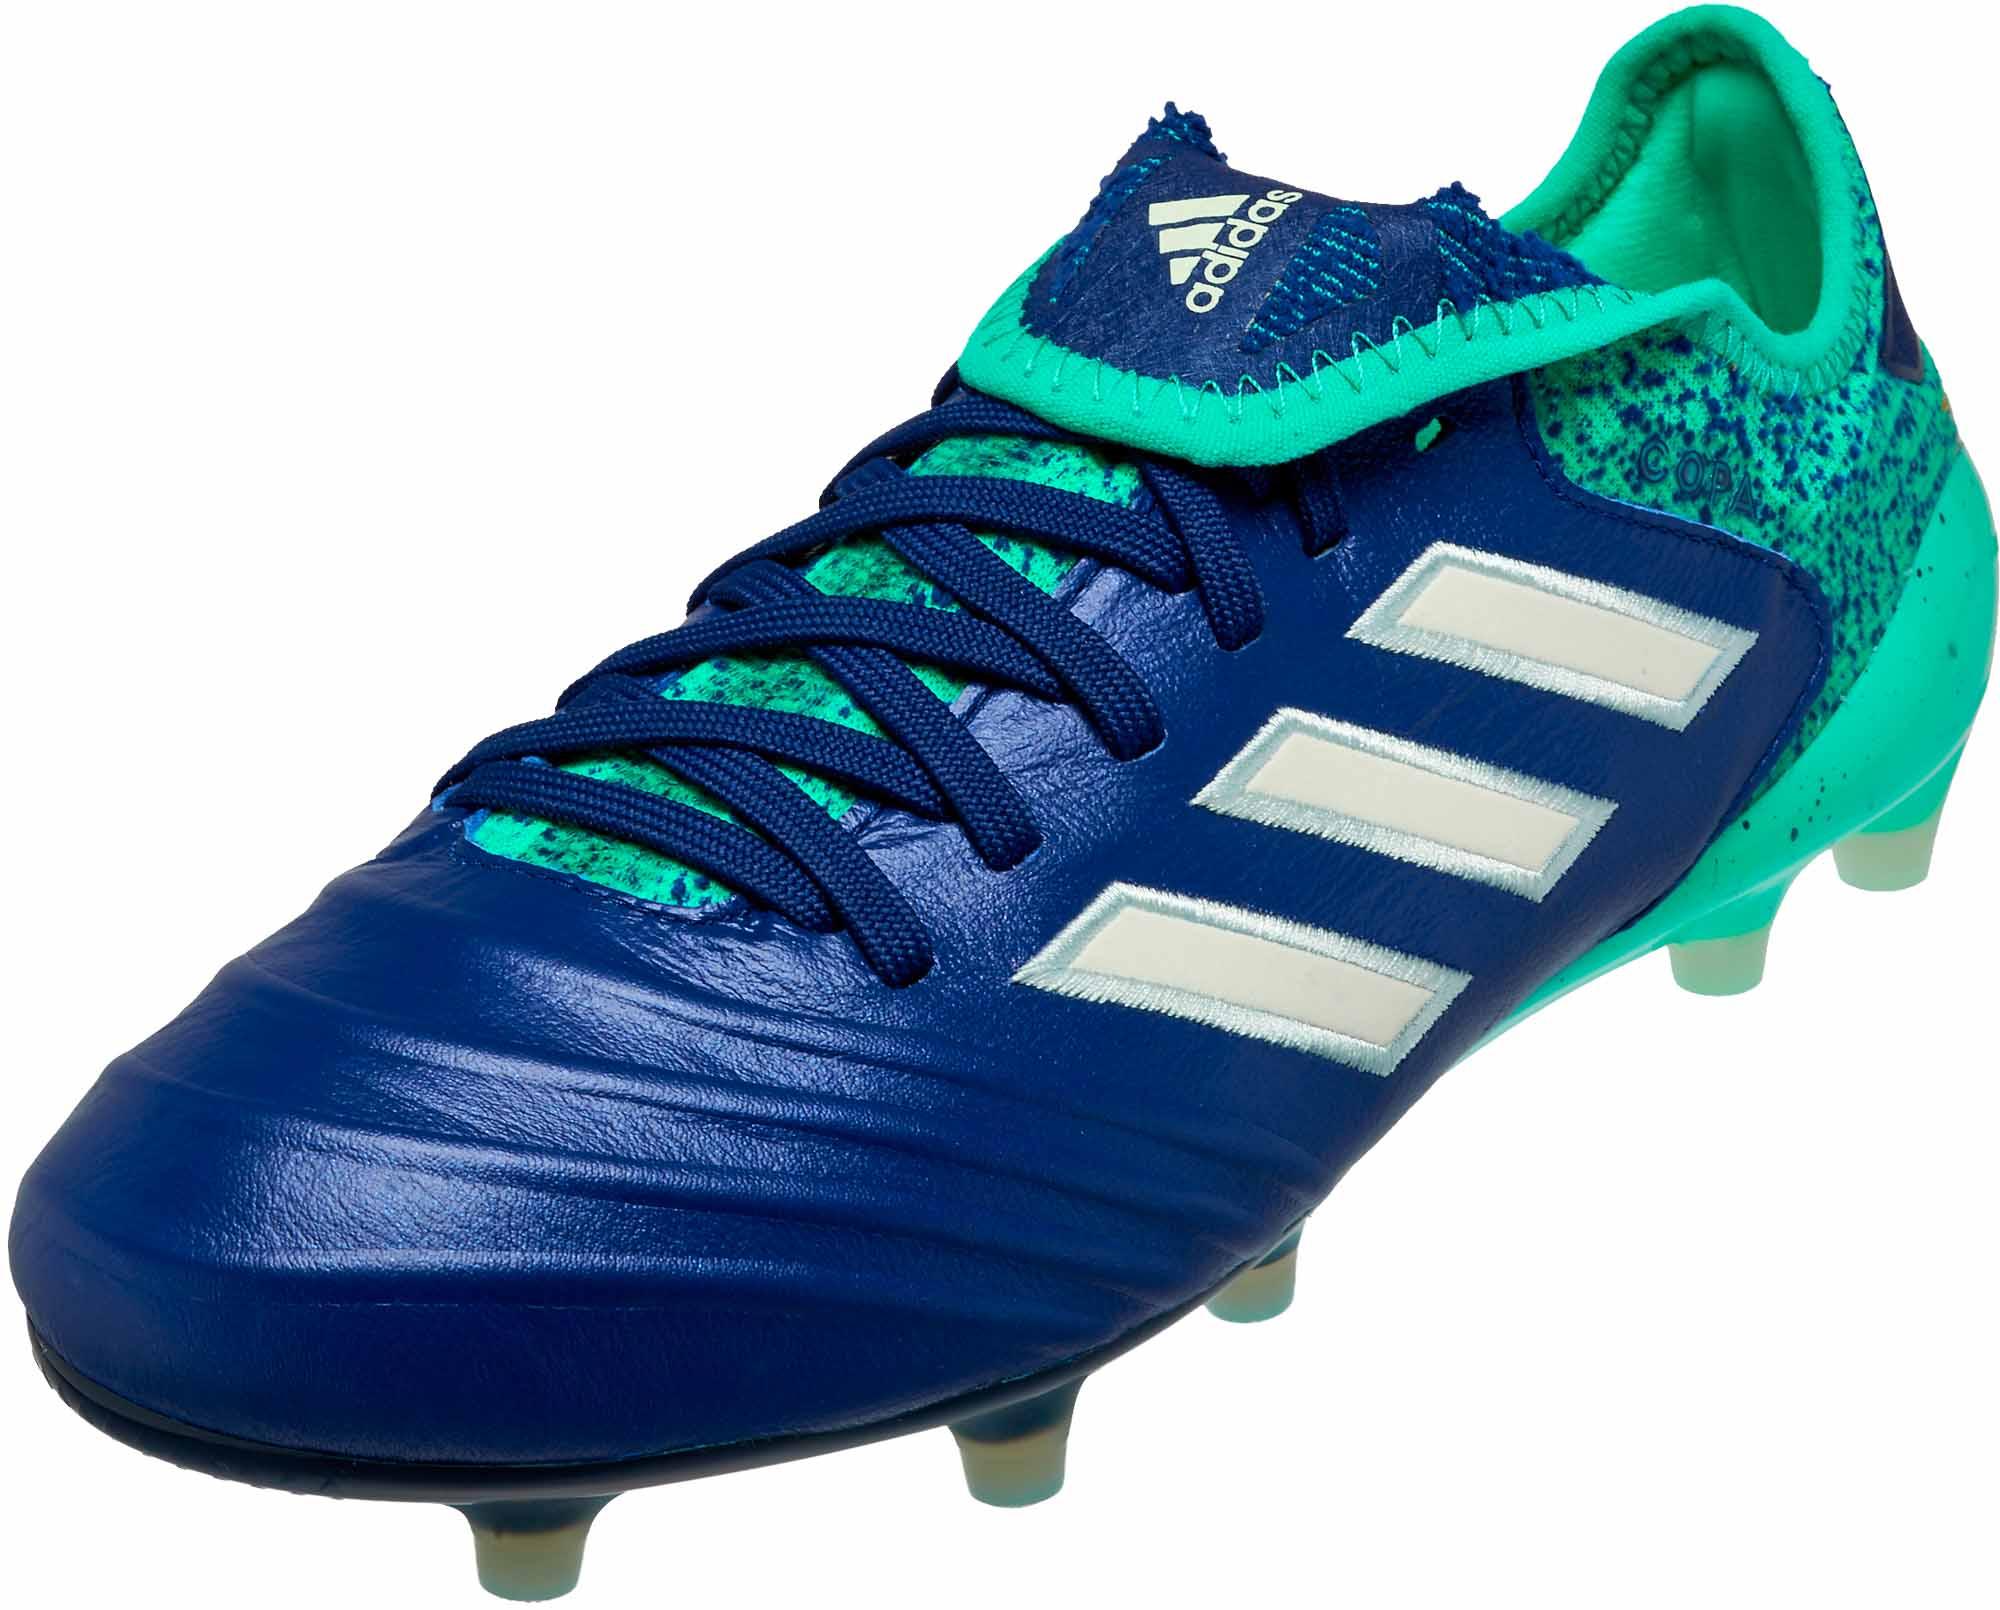 ff529c78466 adidas Copa 18.1 FG - Aero Green - SoccerPro.com